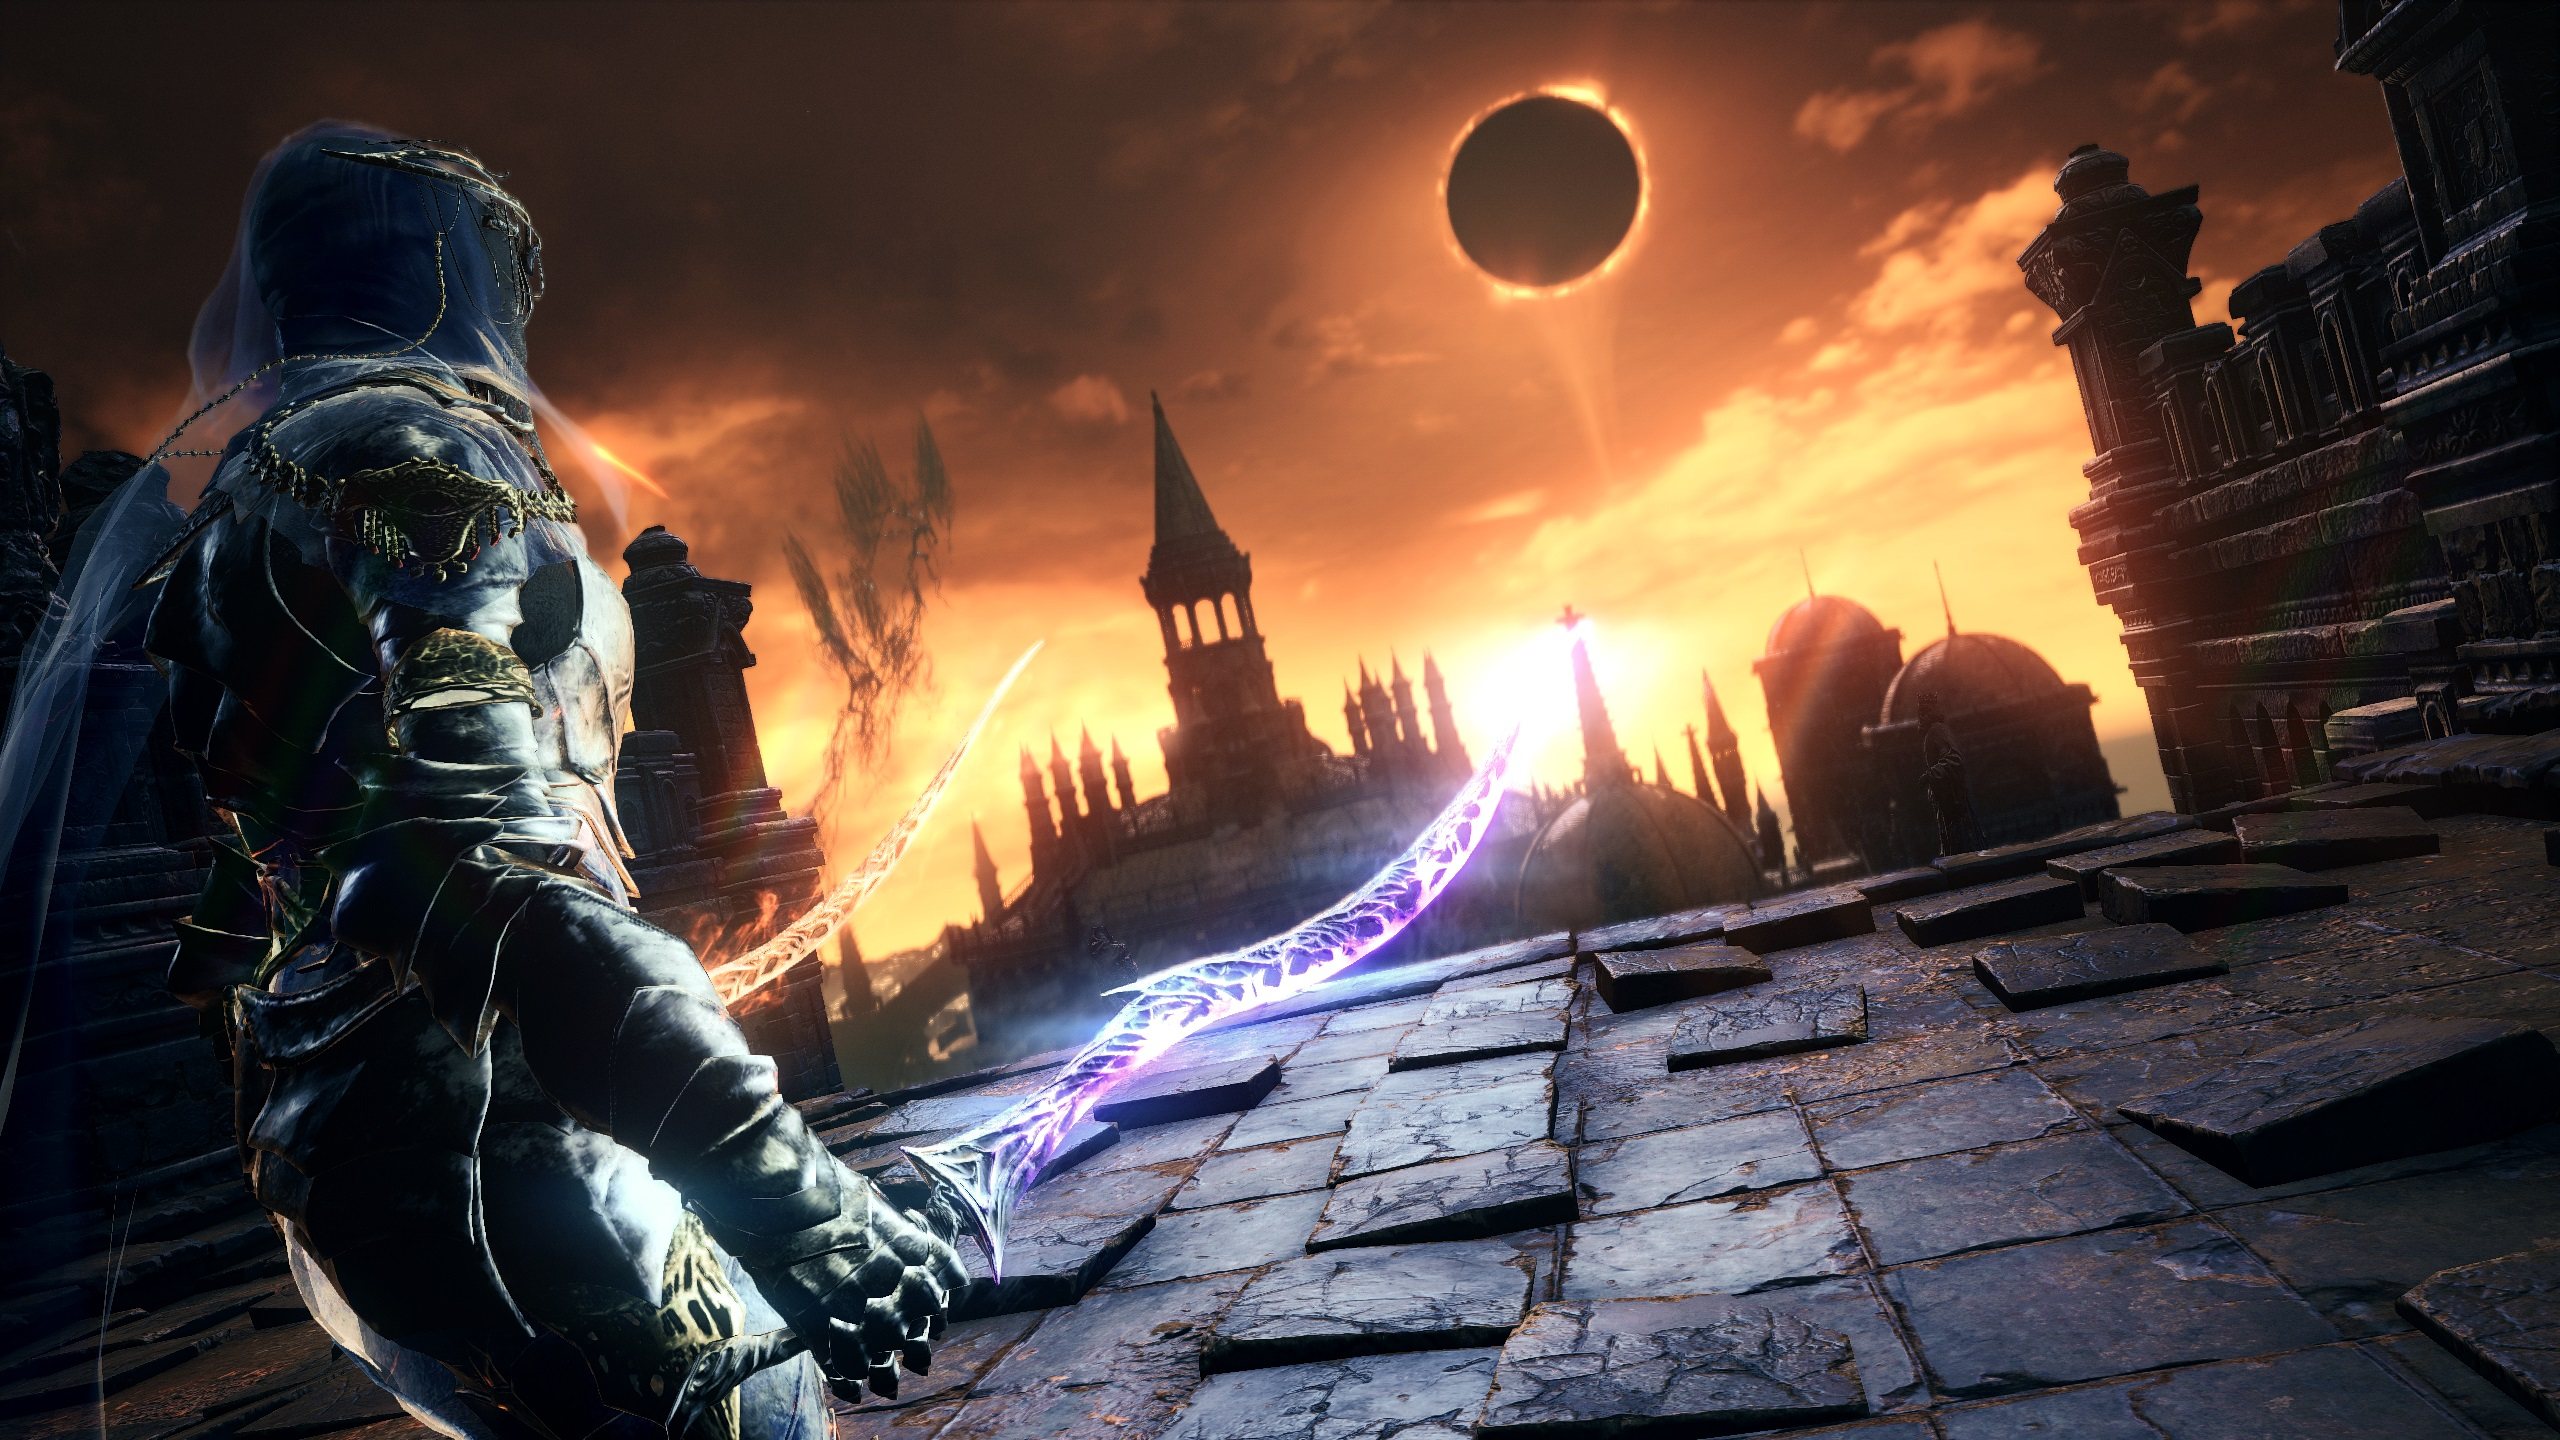 Dark Souls Iii Hd Wallpaper Background Image 2560x1440 Id